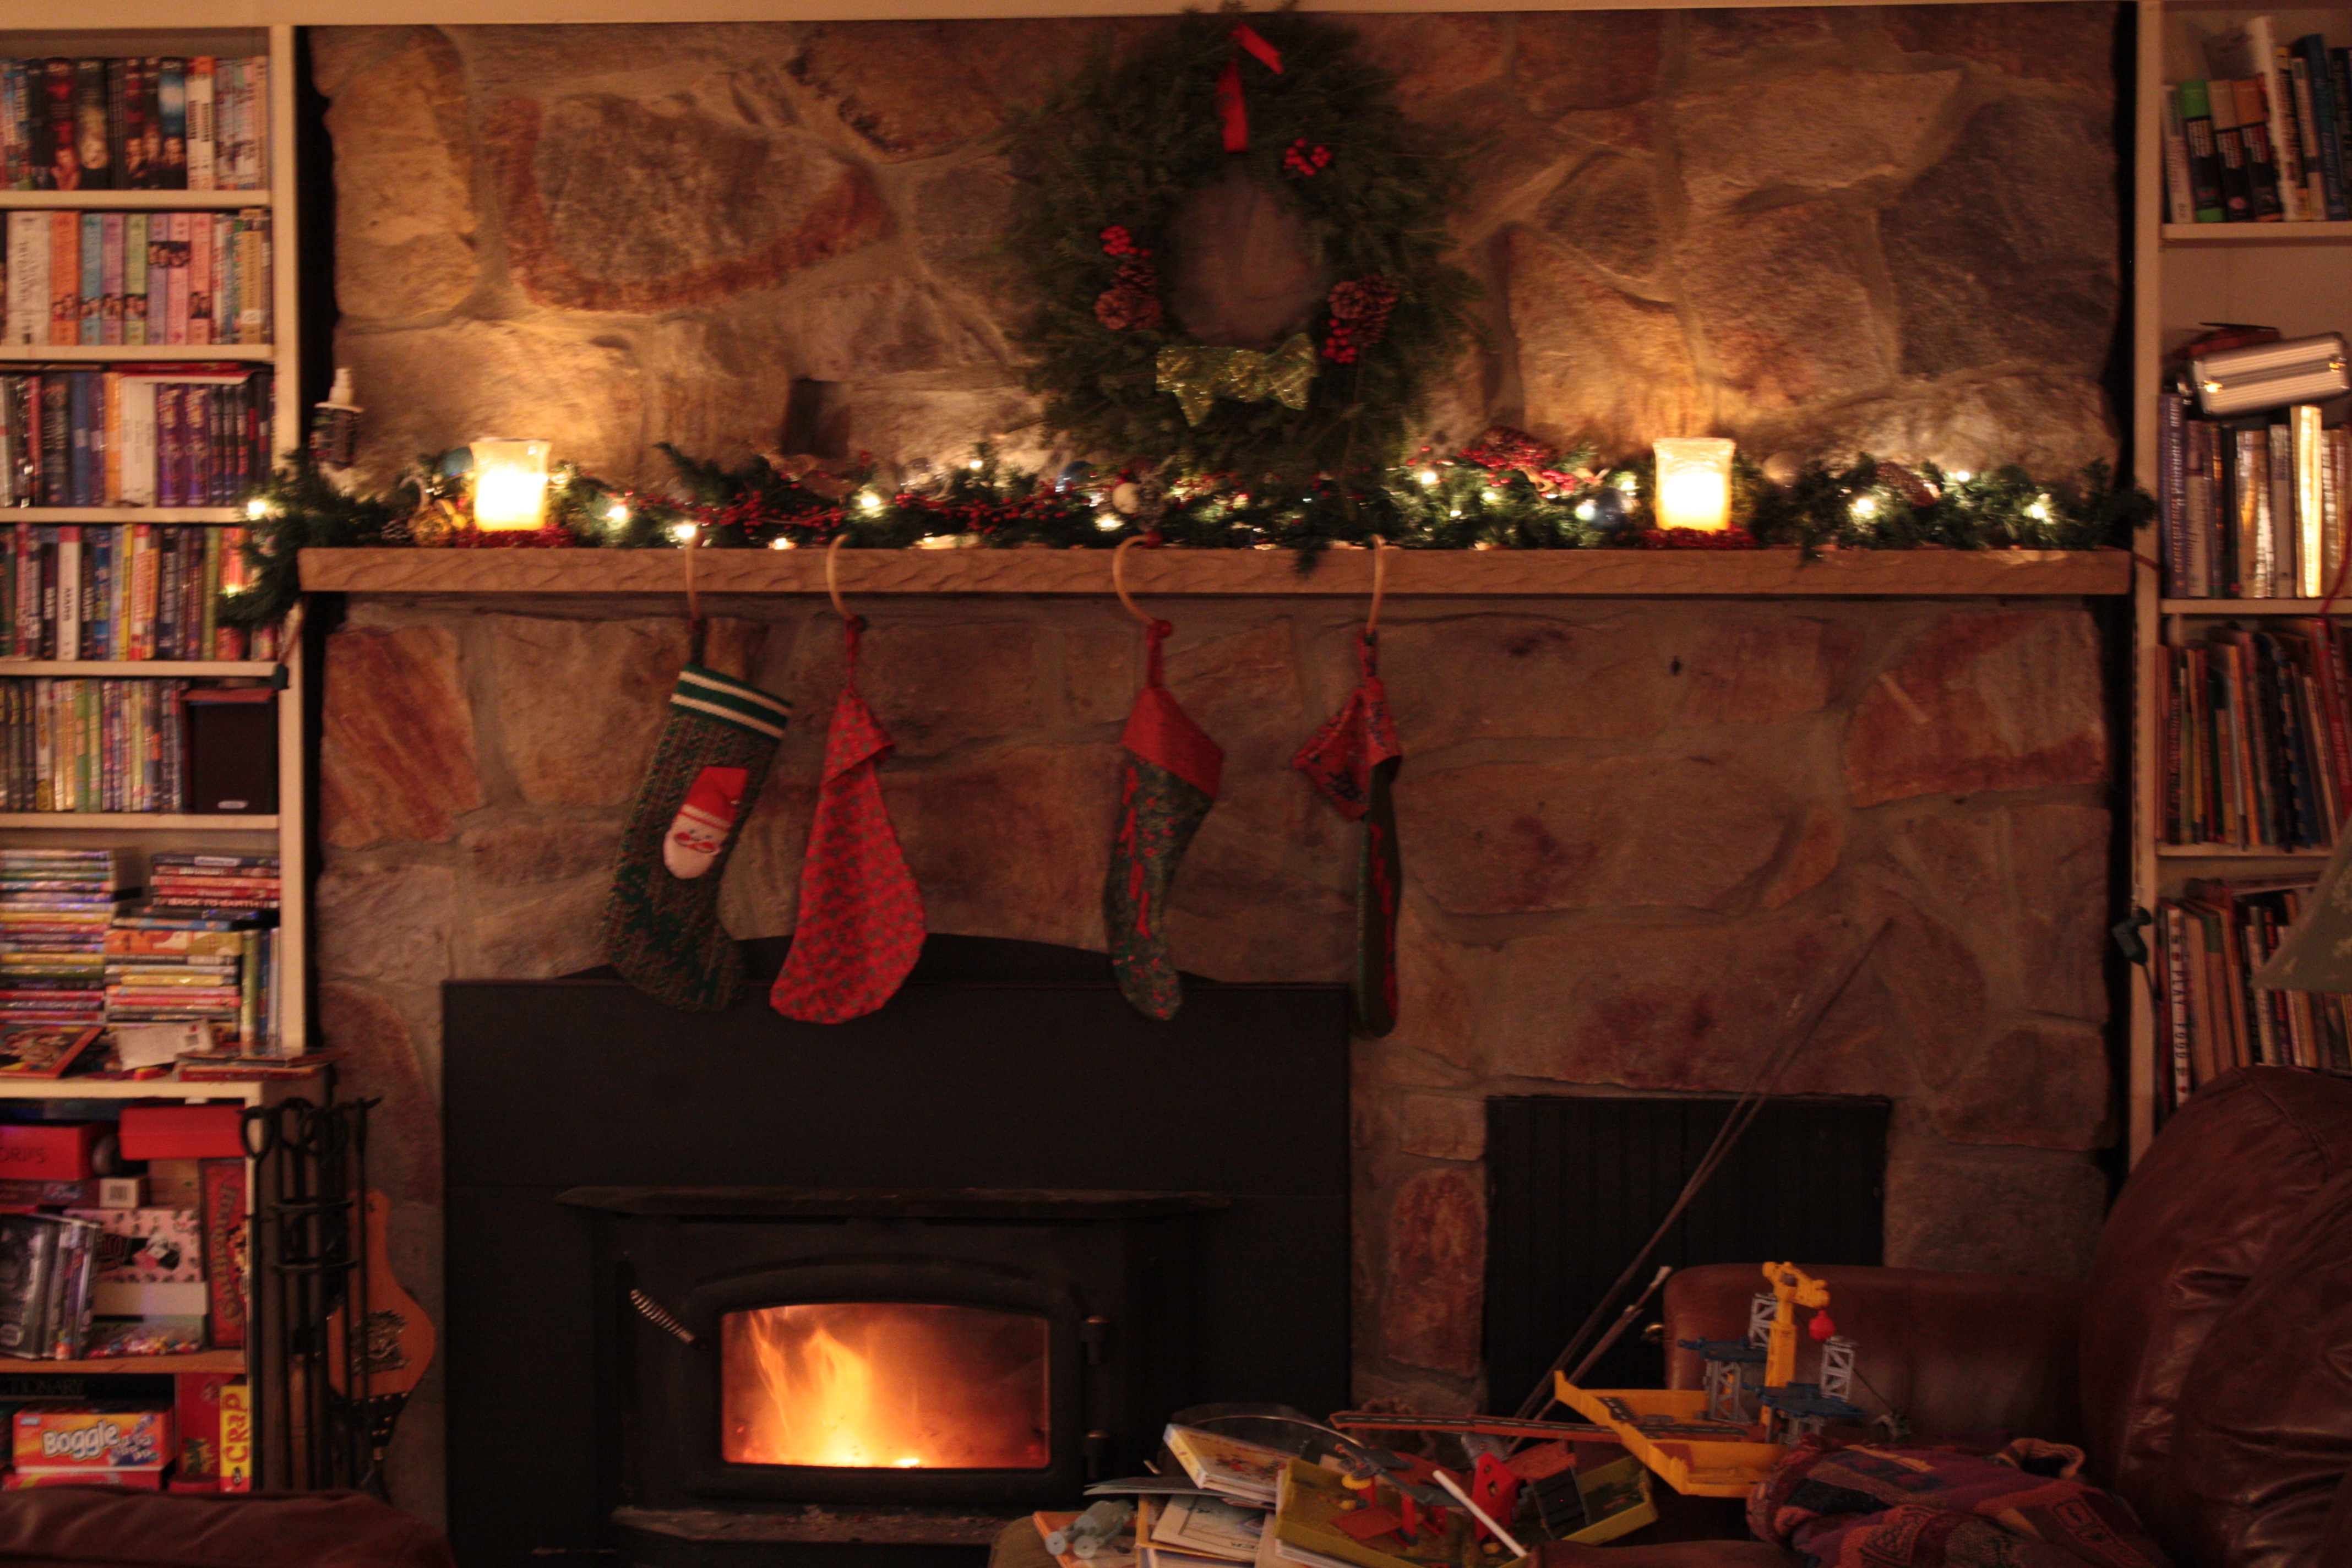 Christmas Hearth.Cozy Christmas Hearth The Fair View